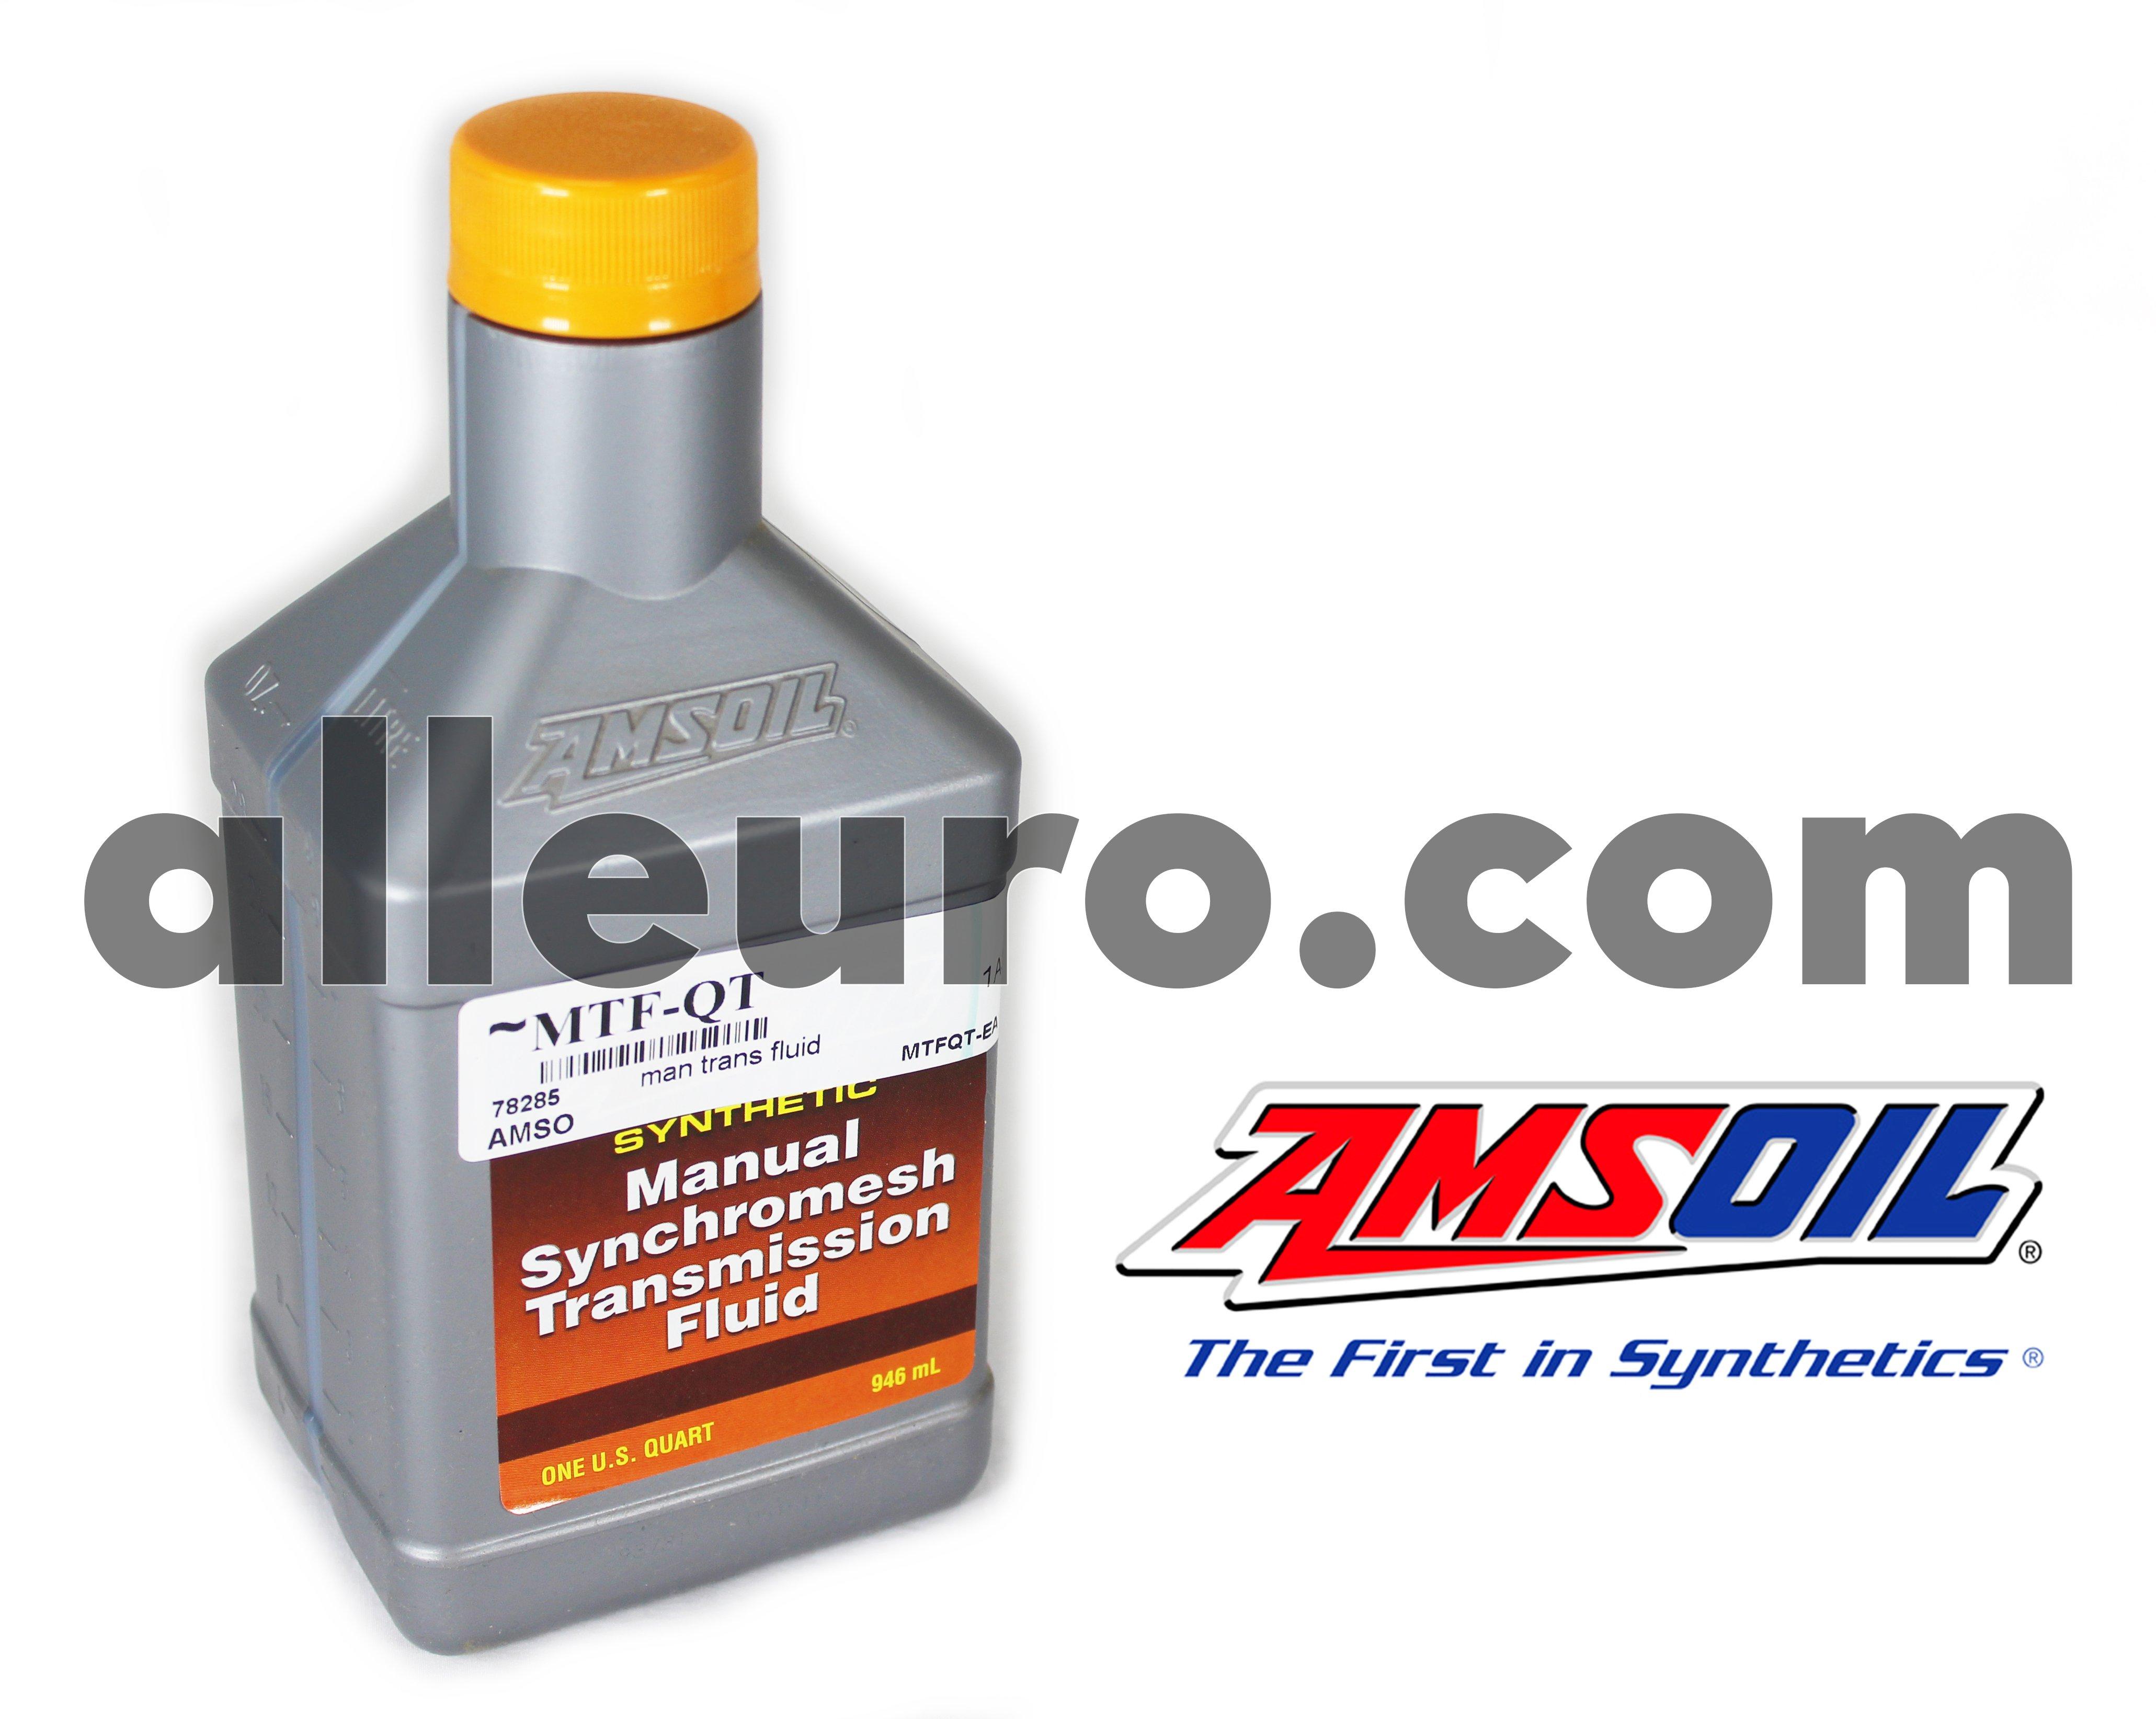 Amsoil Gear Lube / Lubricant MTF-QT - Amsoil Manual Transmission Lube 5w30 synchromesh